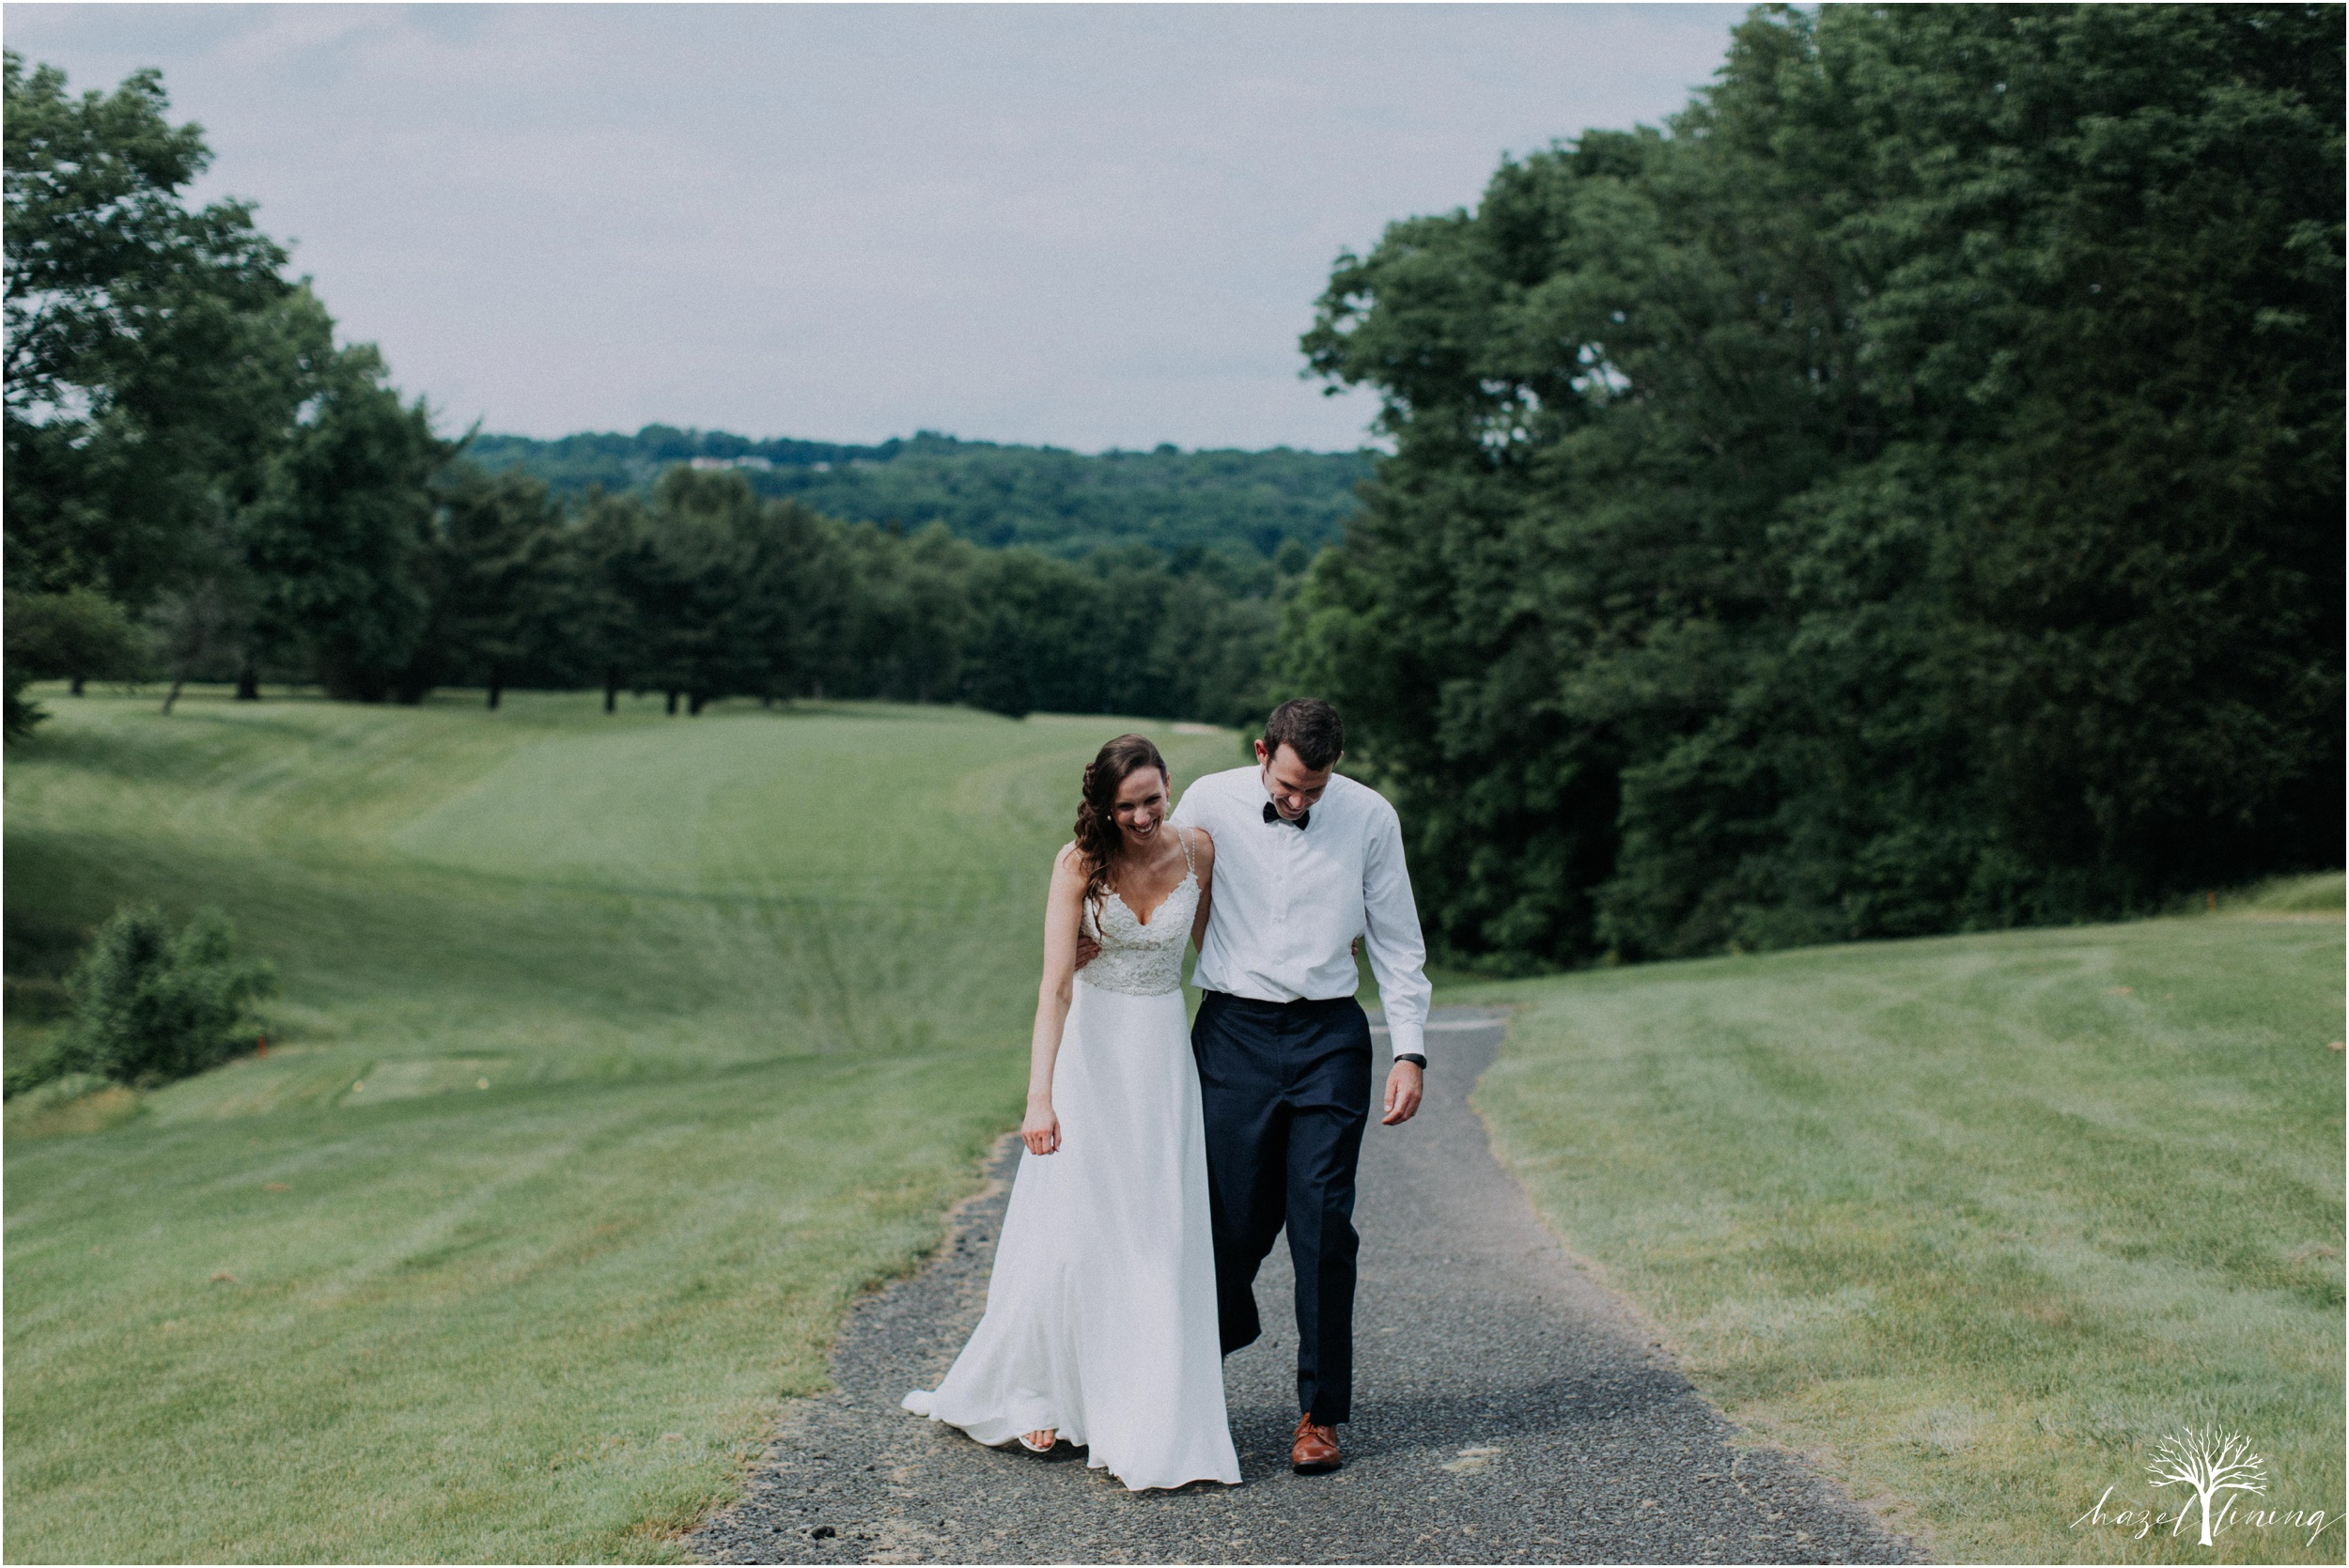 hazel-lining-travel-wedding-elopement-photography_0112.jpg